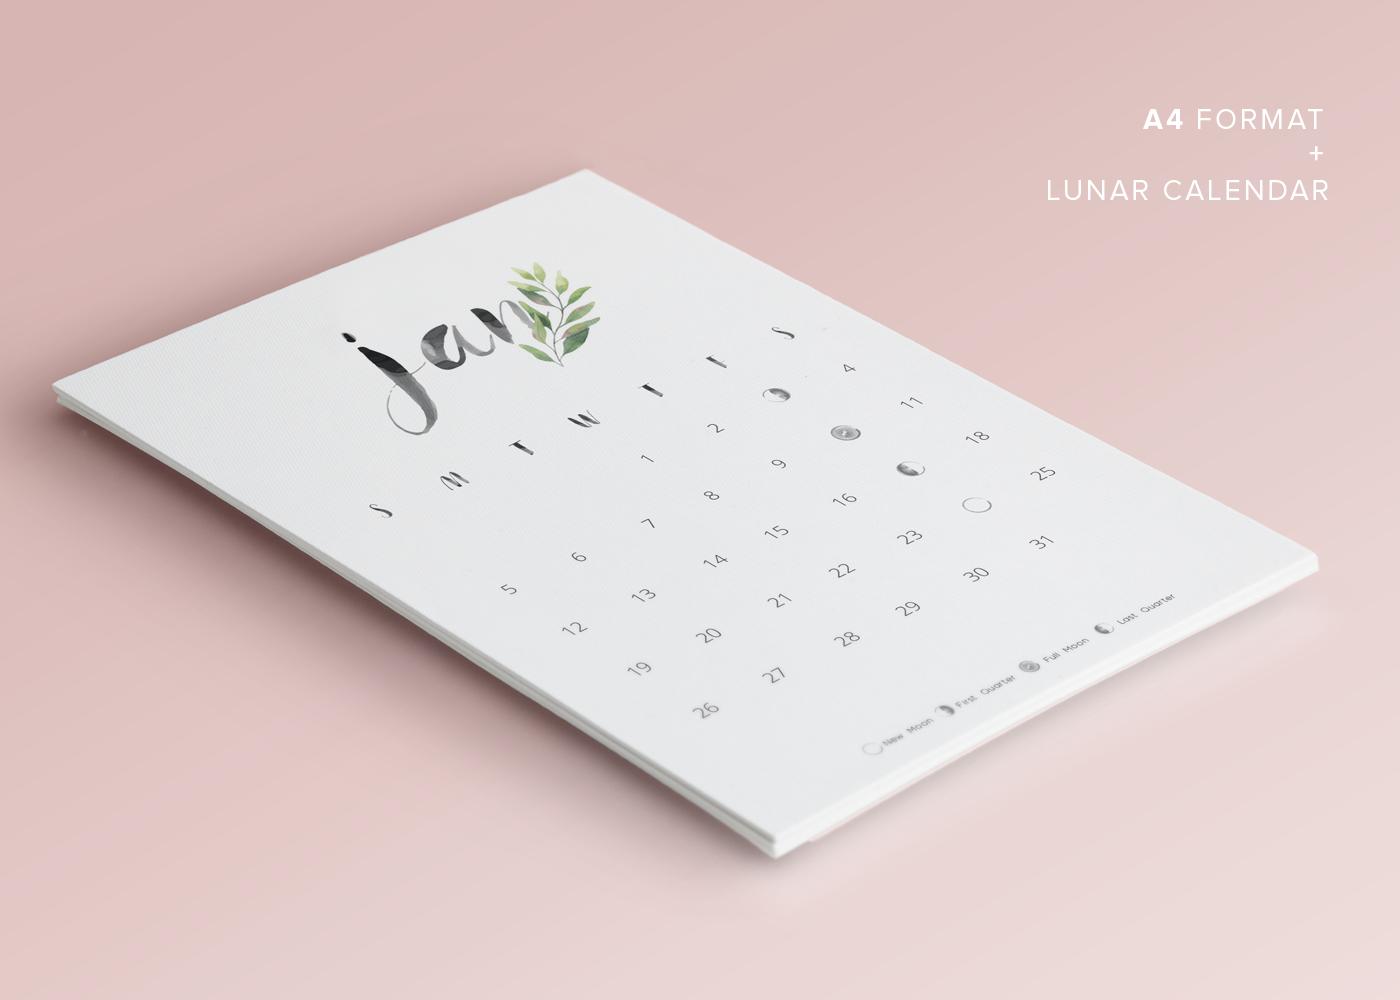 2020 calendar,calendar,calendario,Calendário Lunar,free,free download,freebie,lunar calendar,watercolor,printable